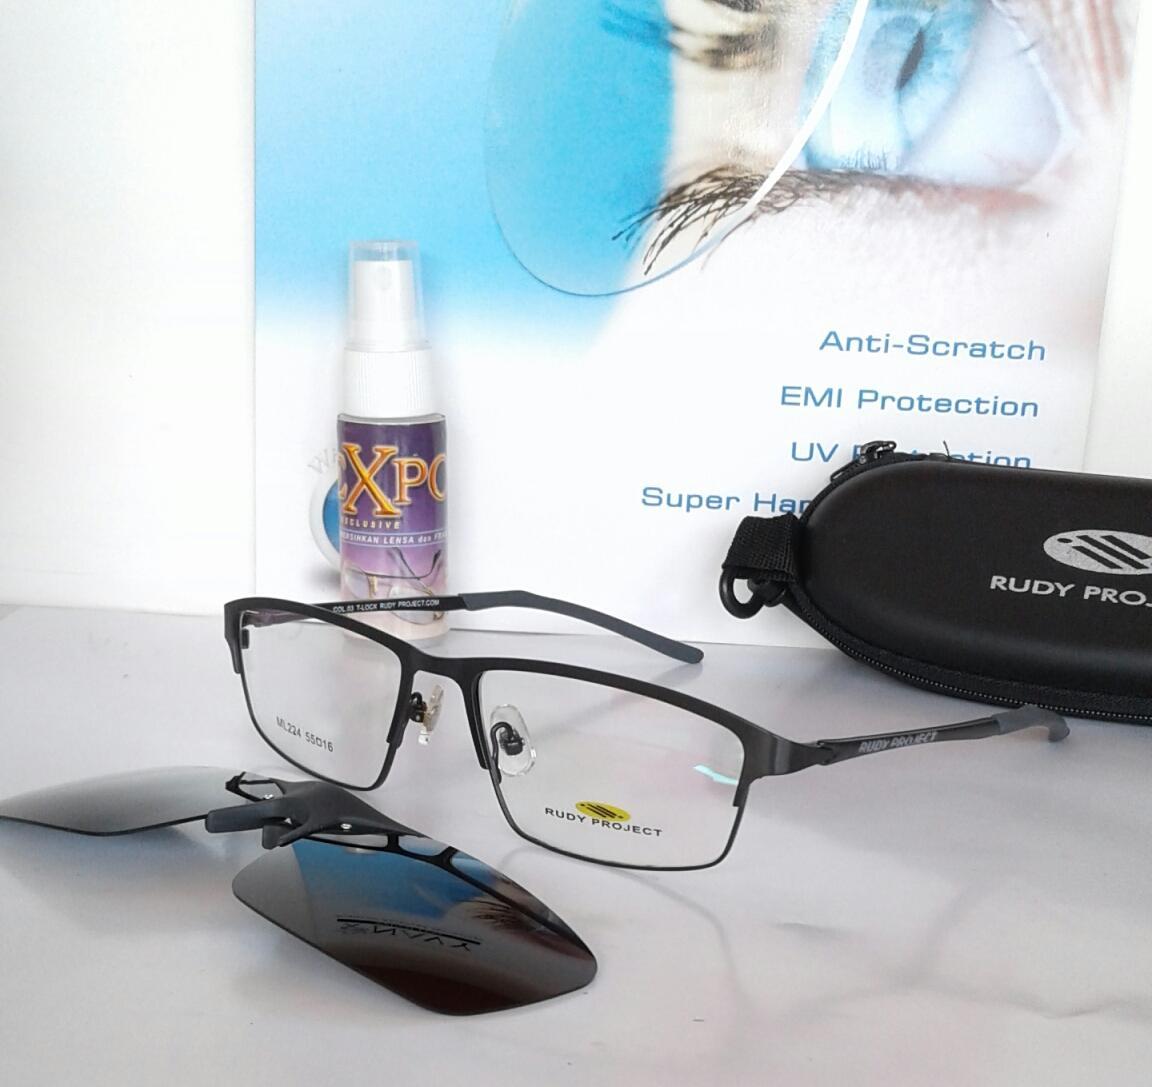 Referensi Harga Kacamata Polarized Minus November 2018 Paling Baru Frame Clip On 5 Lensa Anti Radiasi Uv Hitam Magnet Sunglass Gaya Rayban Oakley Pria Wanita Rp 224 Blk Kacanata Baca